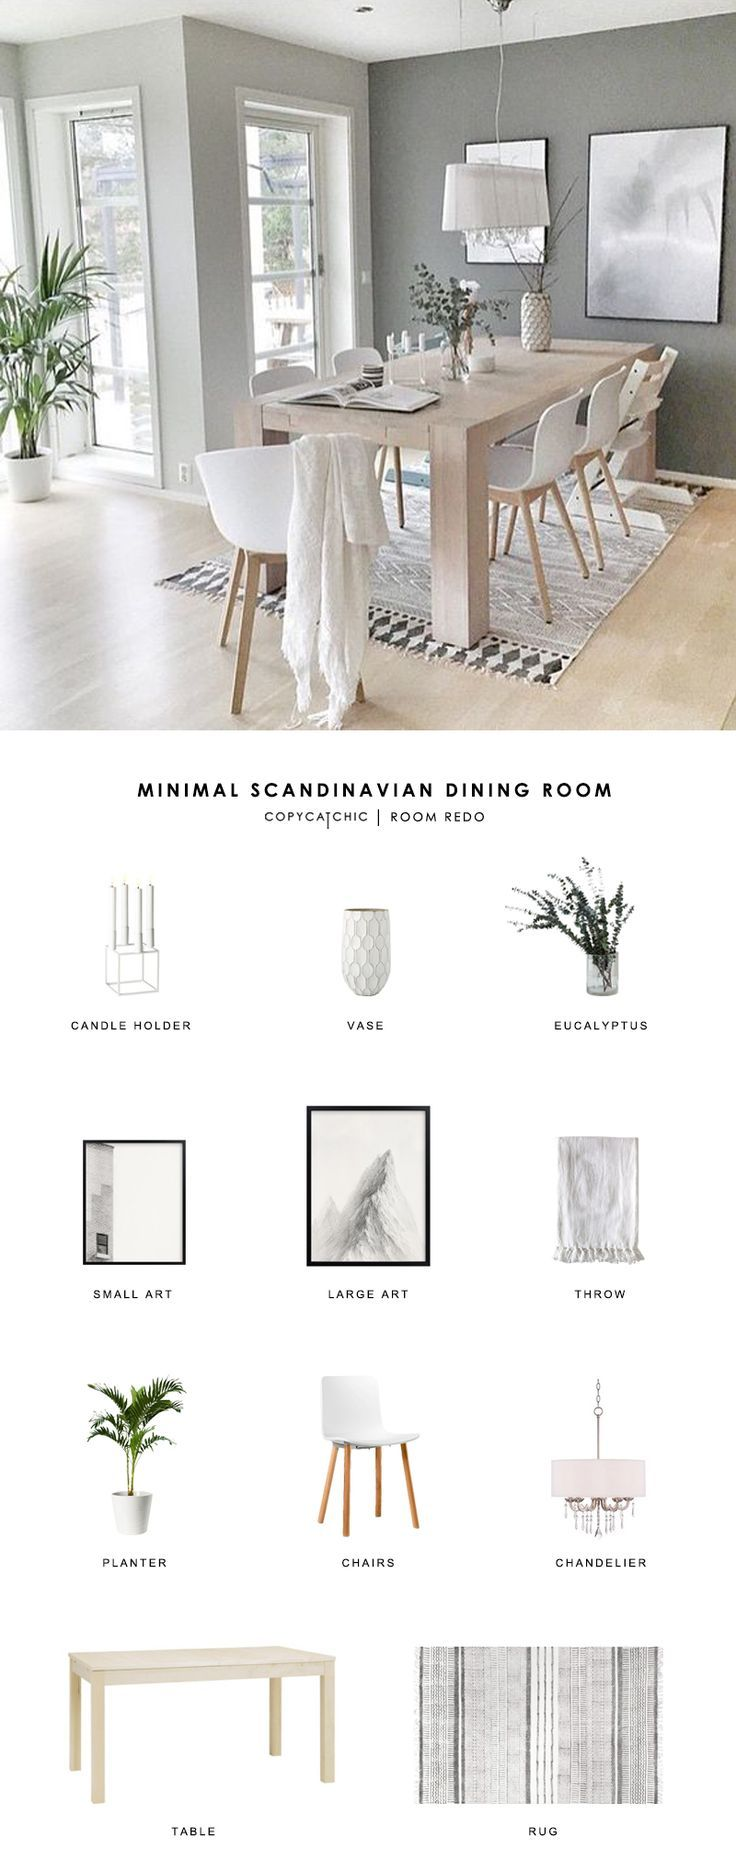 Copy Cat Chic Room Redo | Minimal Scandinavian Dining Room - copycatchic